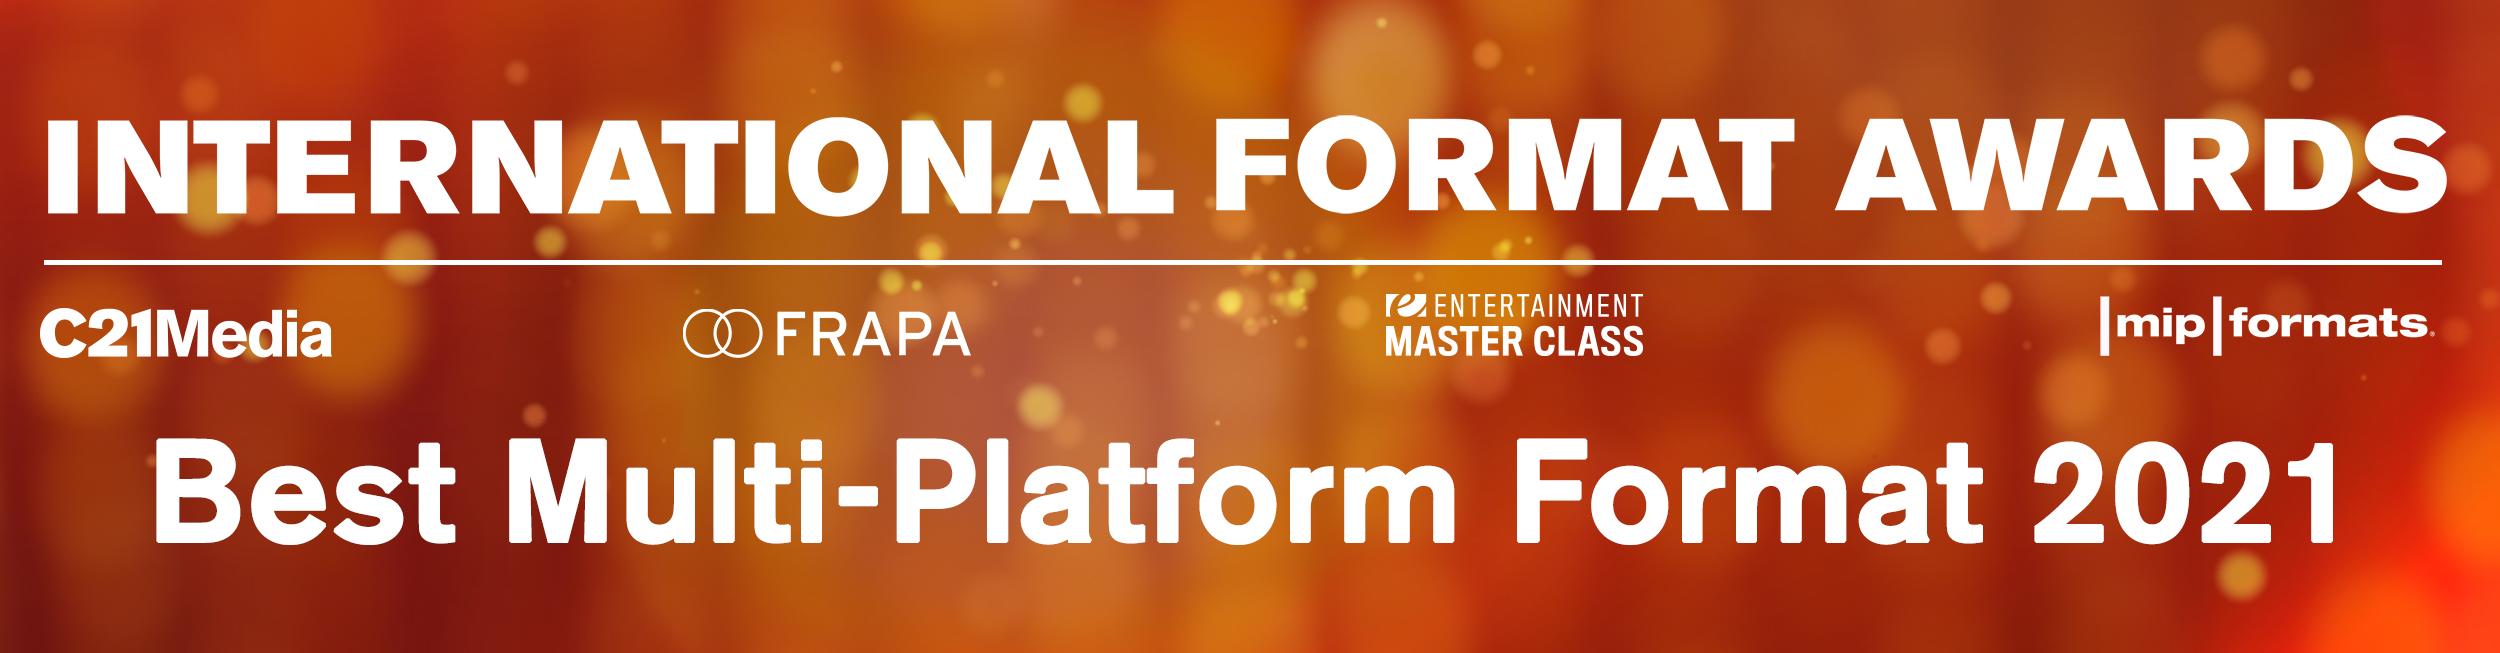 IFA Multi-Platform Banner 2021